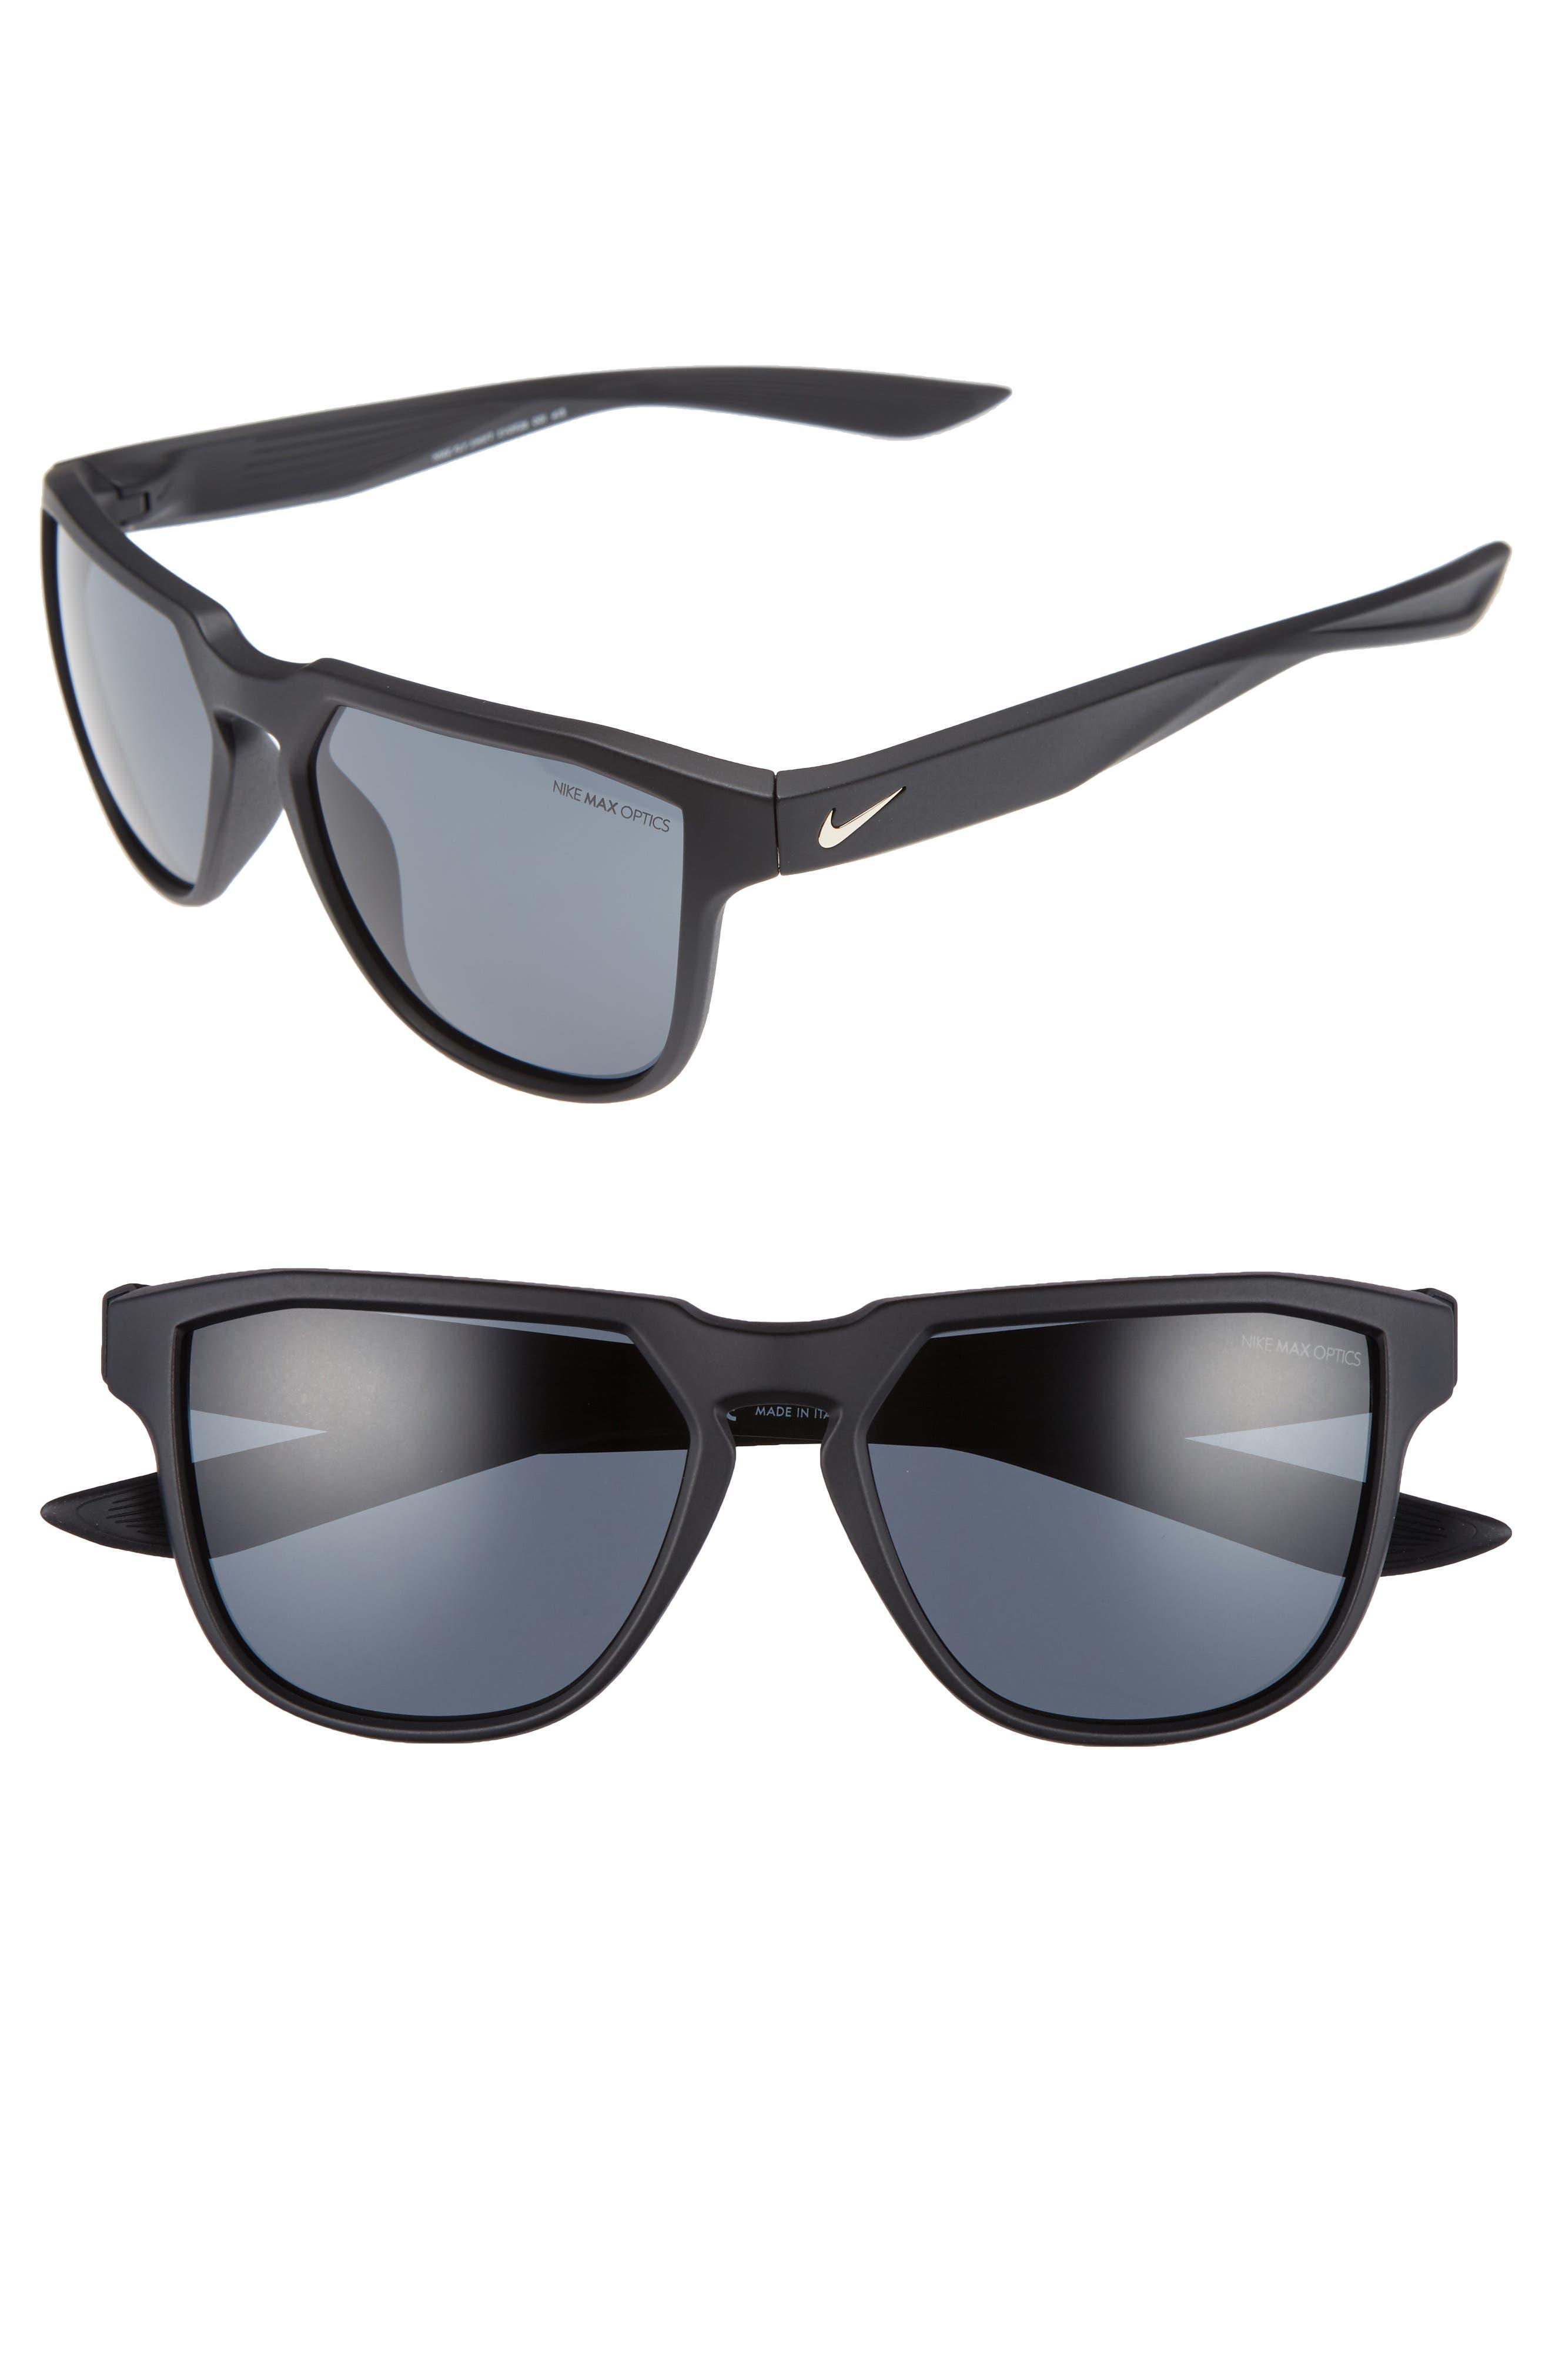 Fly Swift 57mm Sunglasses,                             Main thumbnail 1, color,                             Matte Black/ Gold